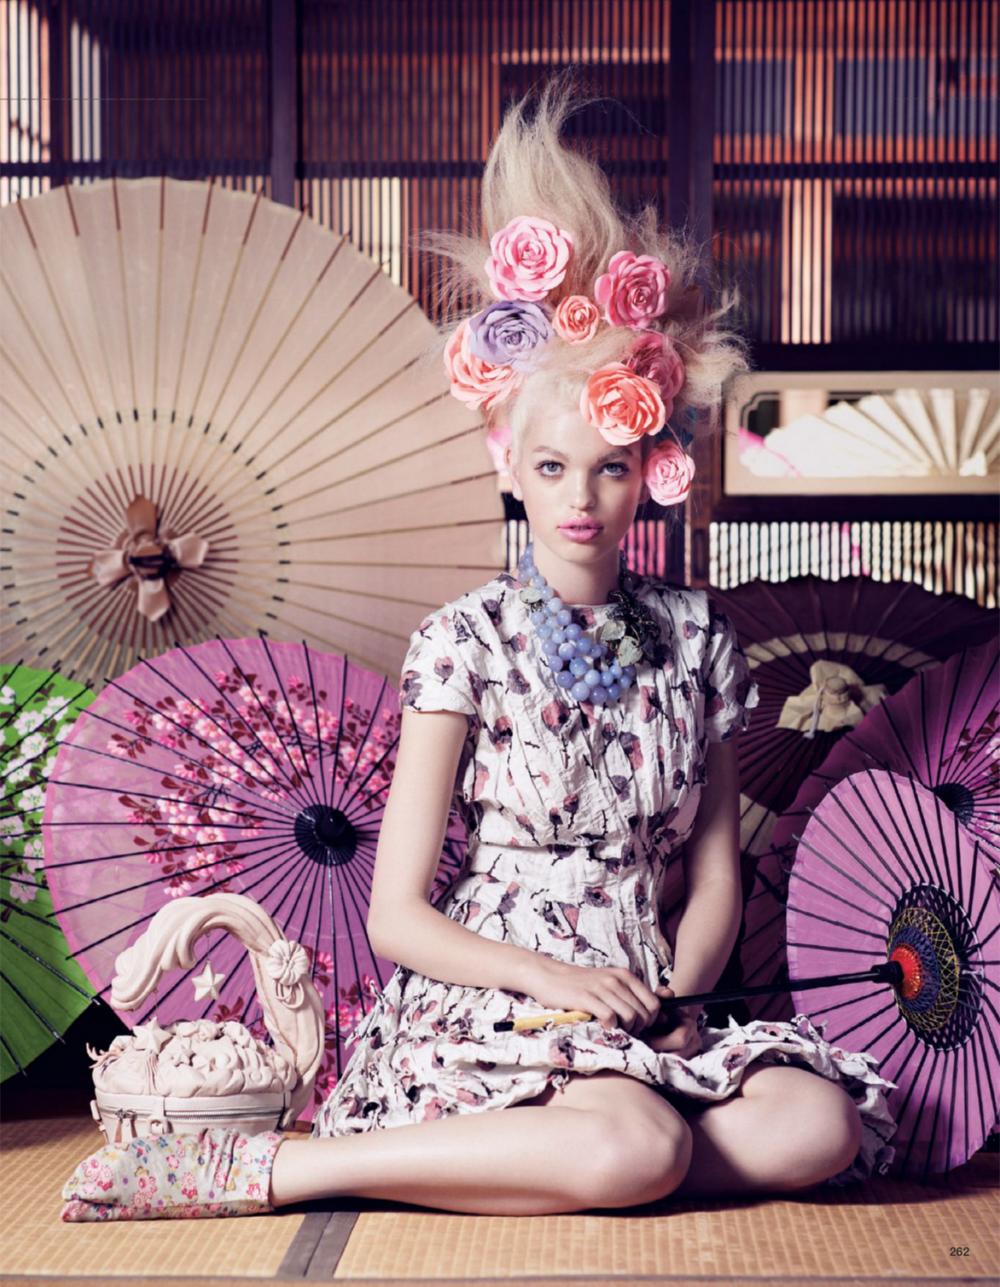 Giovanna-Battaglia-9-The-Secret-Chatter-of-Golden-Monkeys-Vogue-Japan-Mark-Segal.png